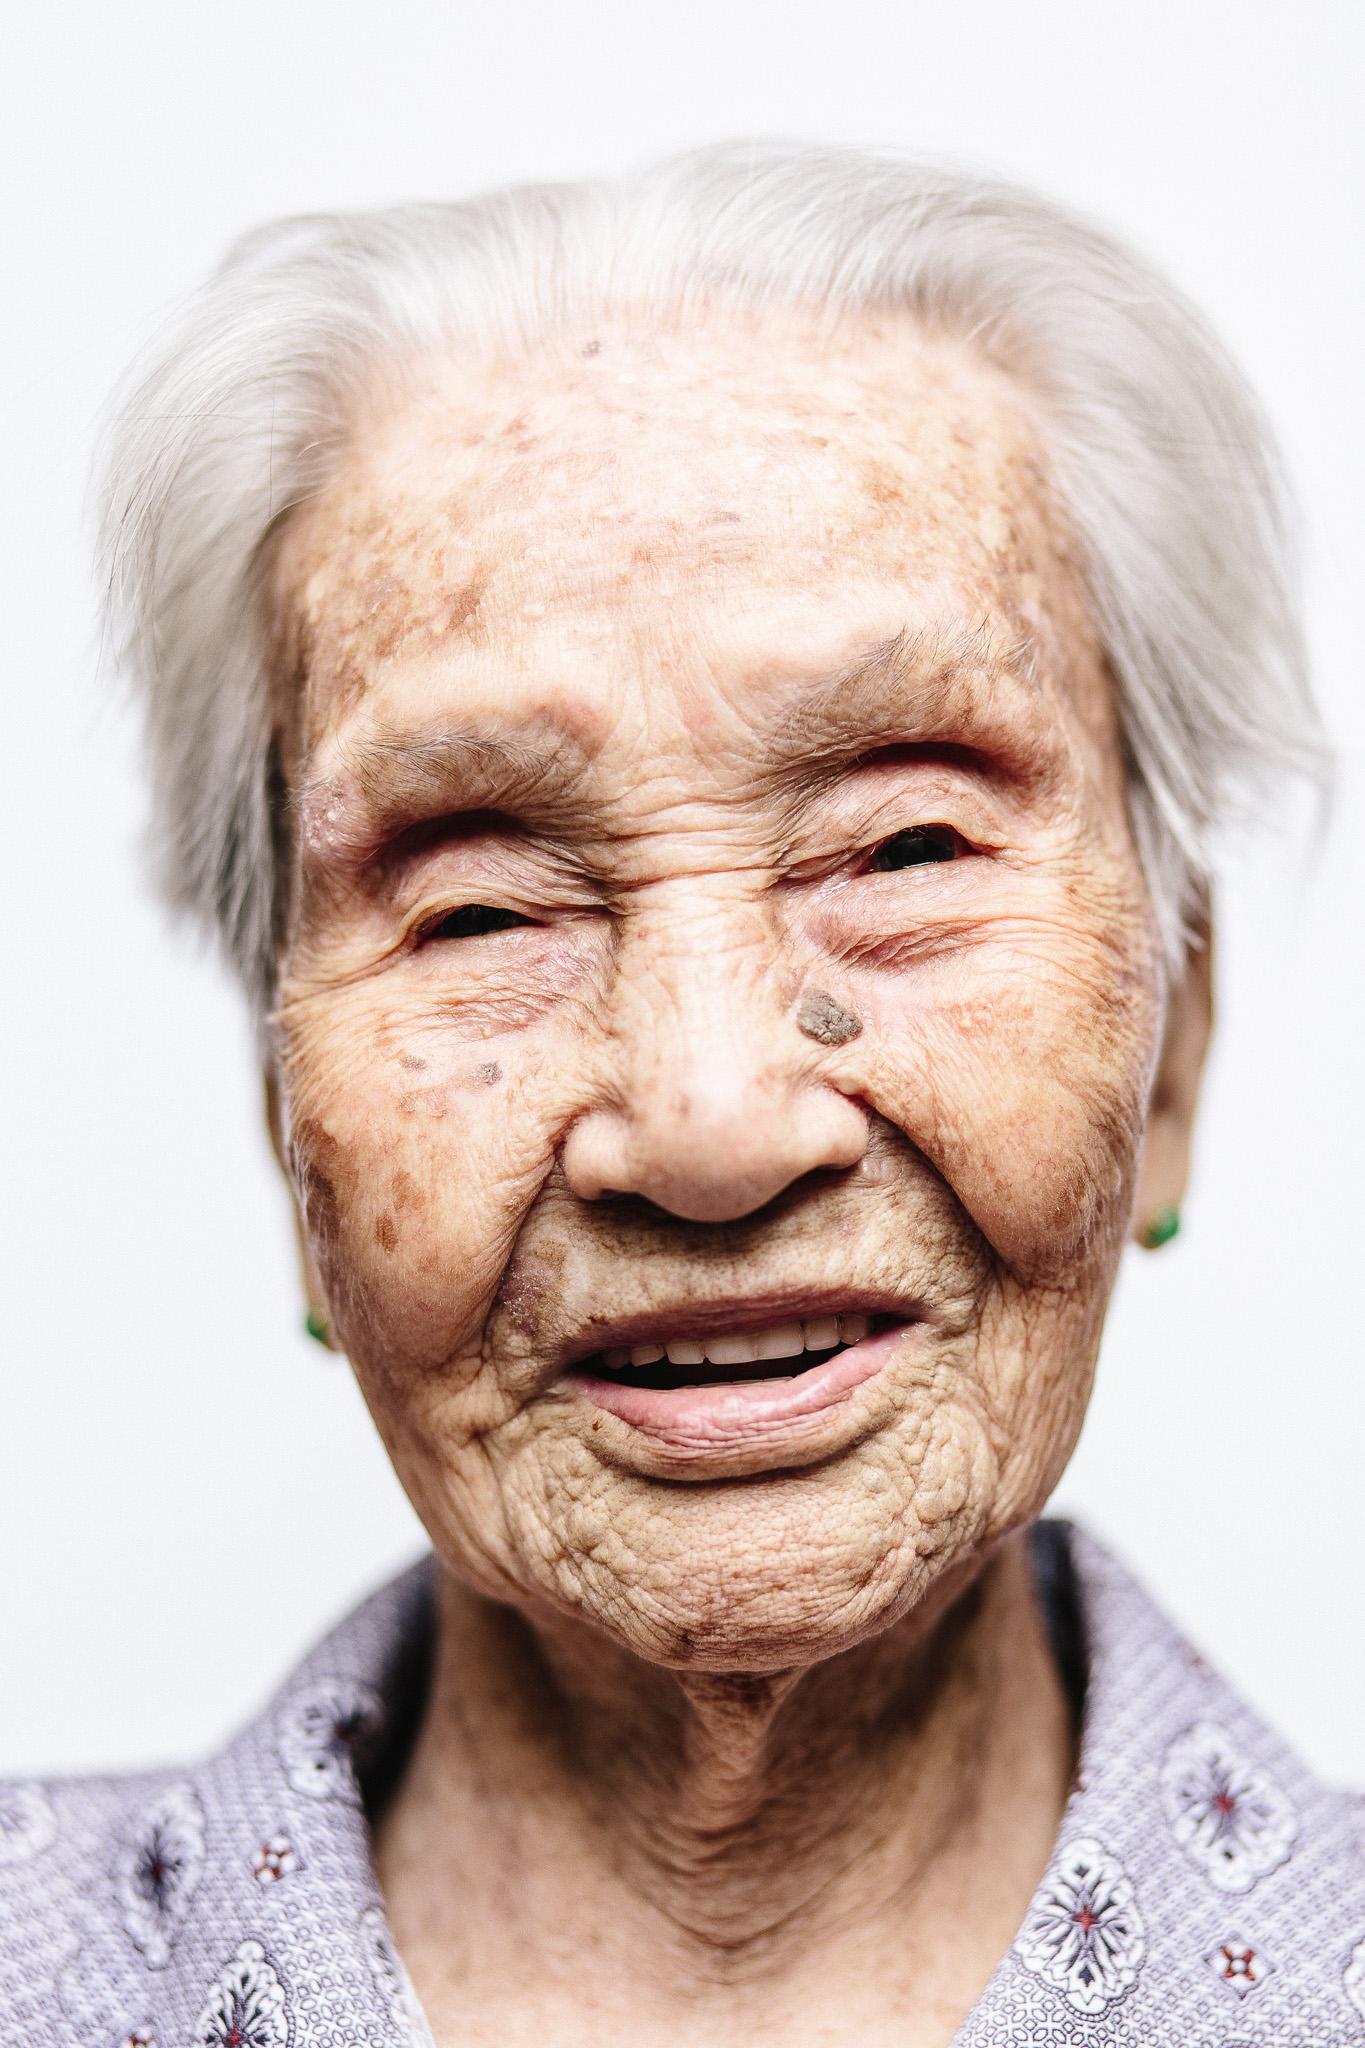 zainal-zainal-studio-centenarians-care-duke-nus-singapore-photographer-19.jpg